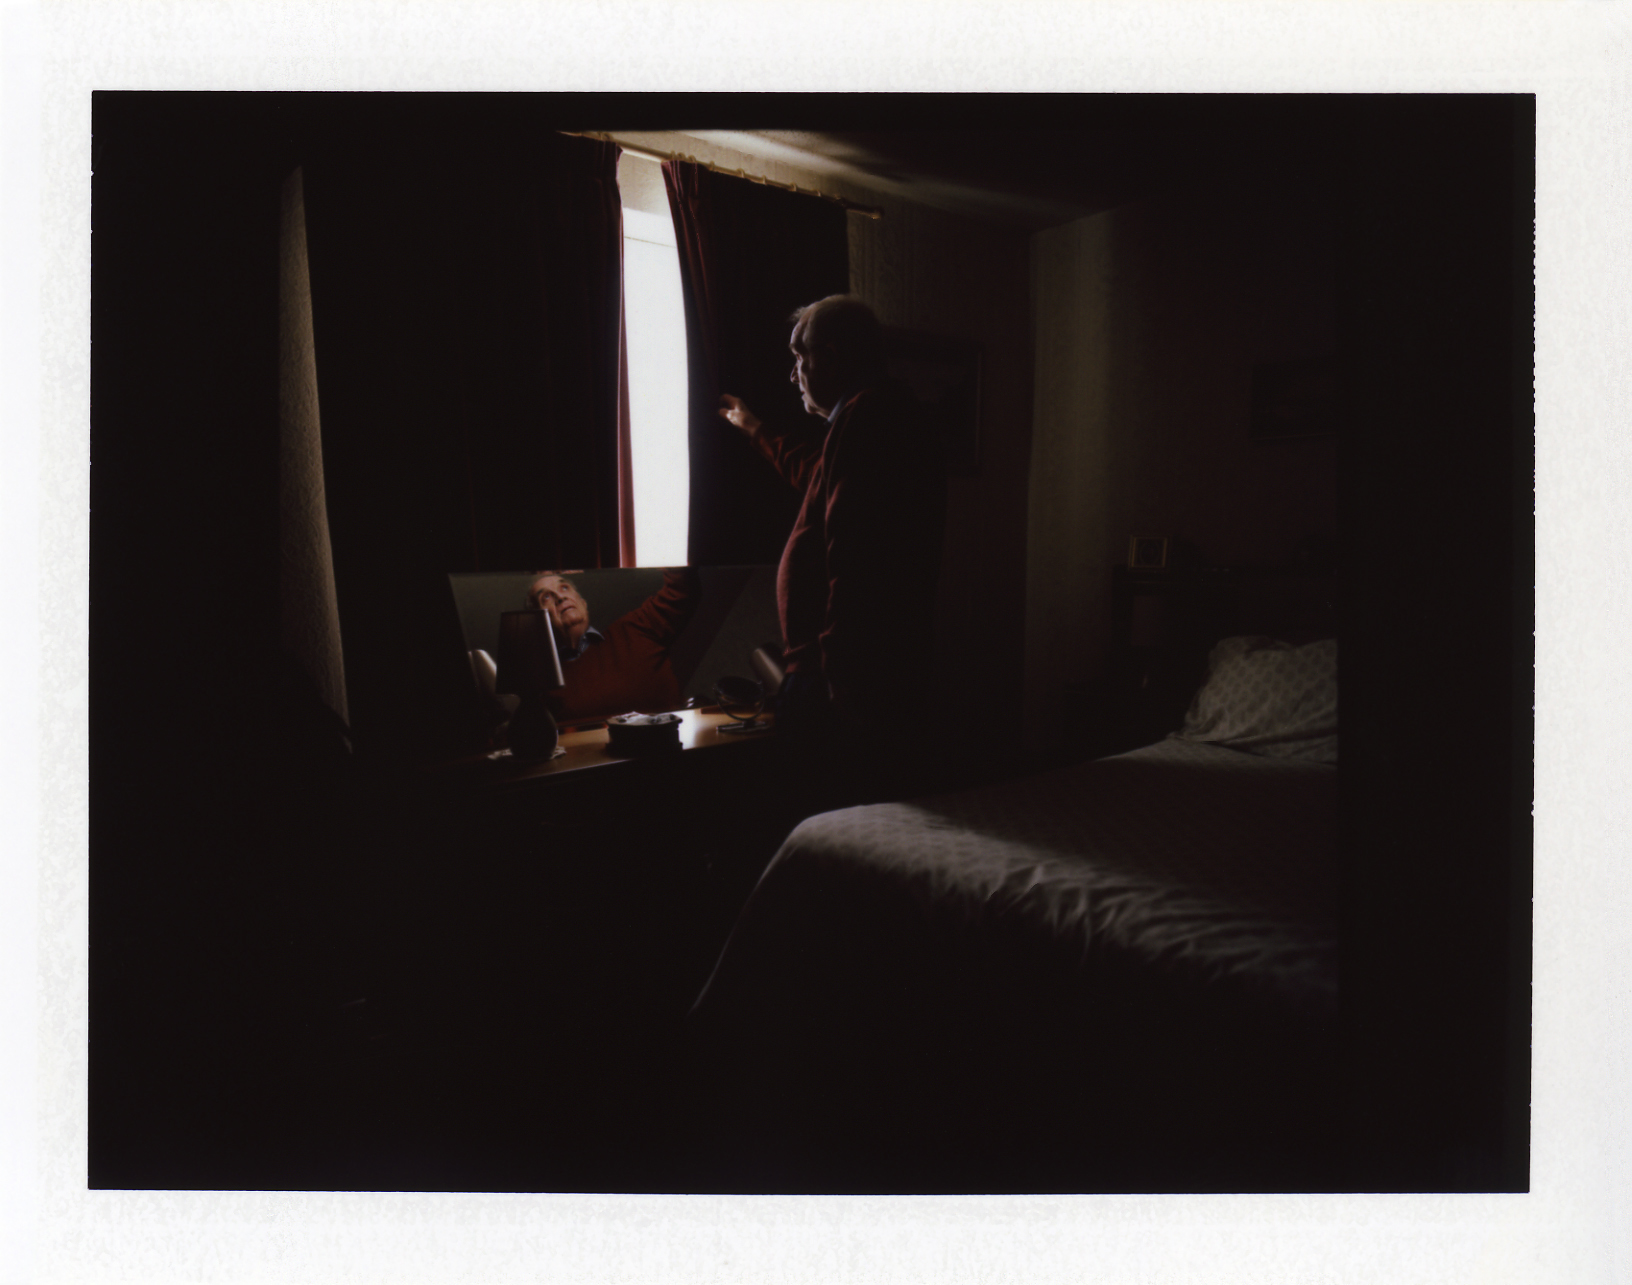 polaroid010sharpen.jpg